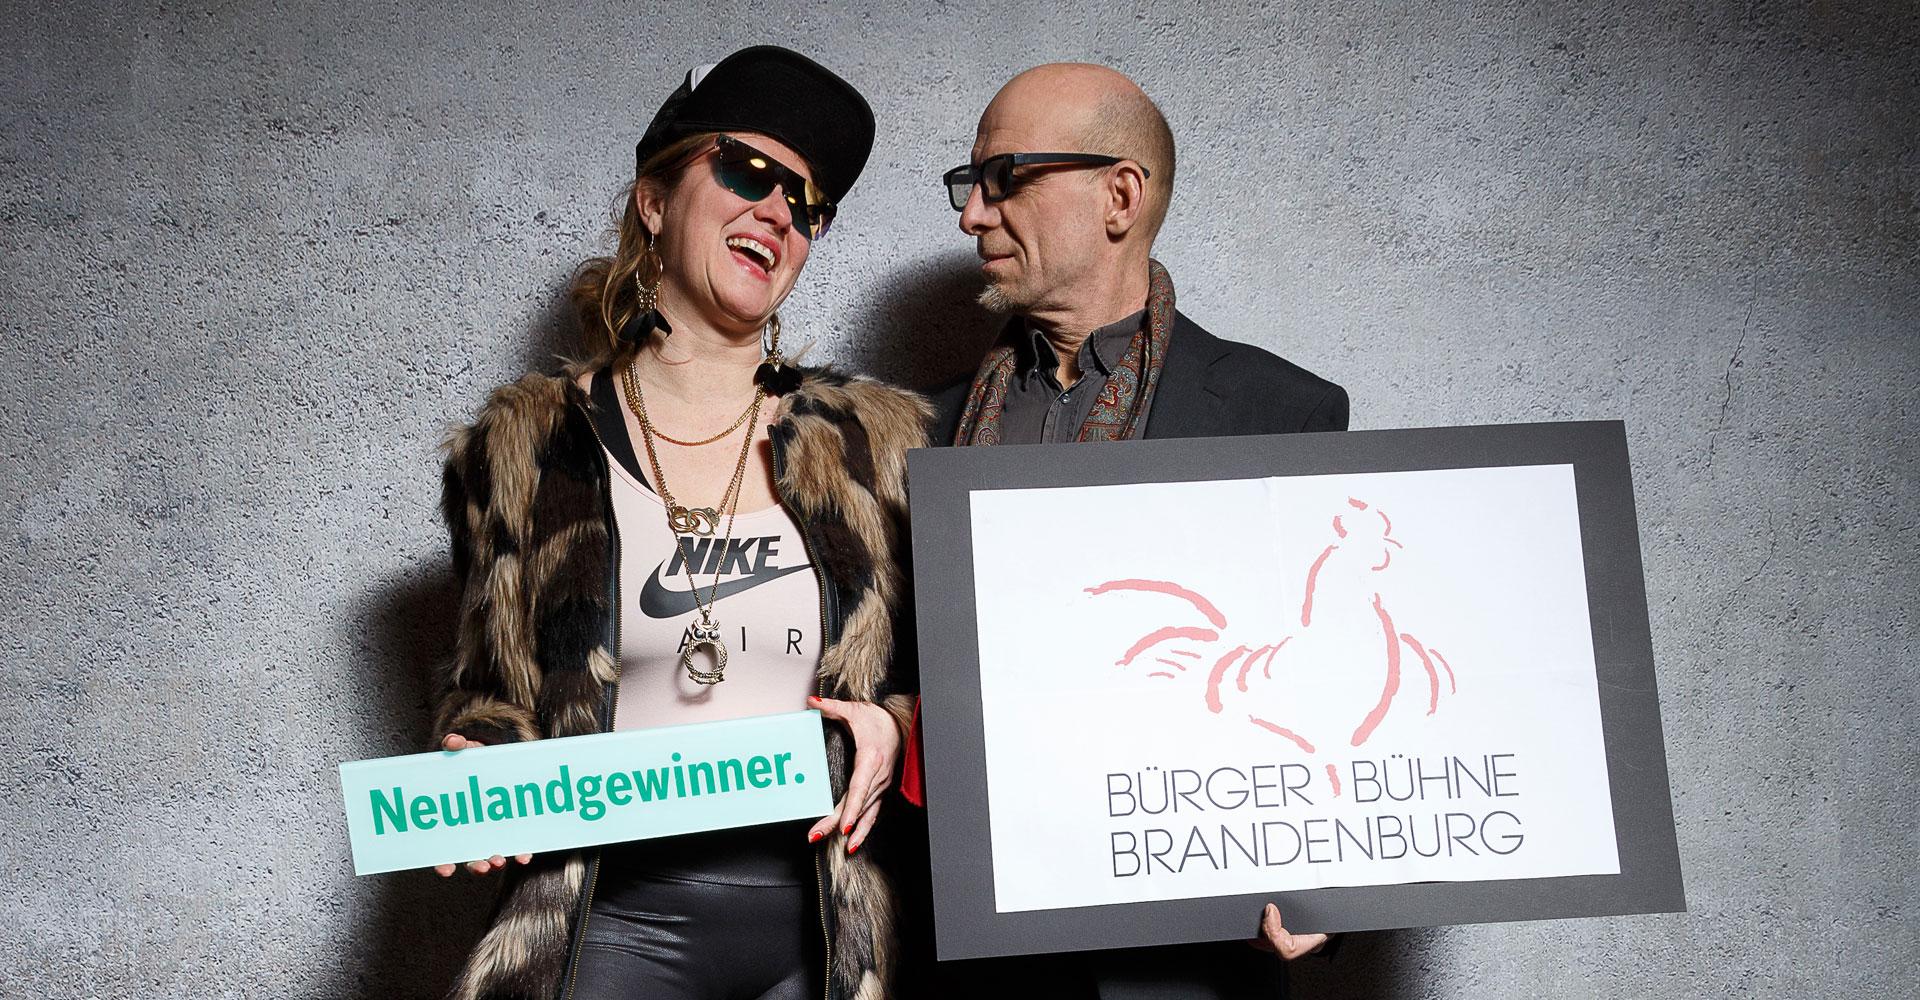 Bürgerbühne Brandenburg